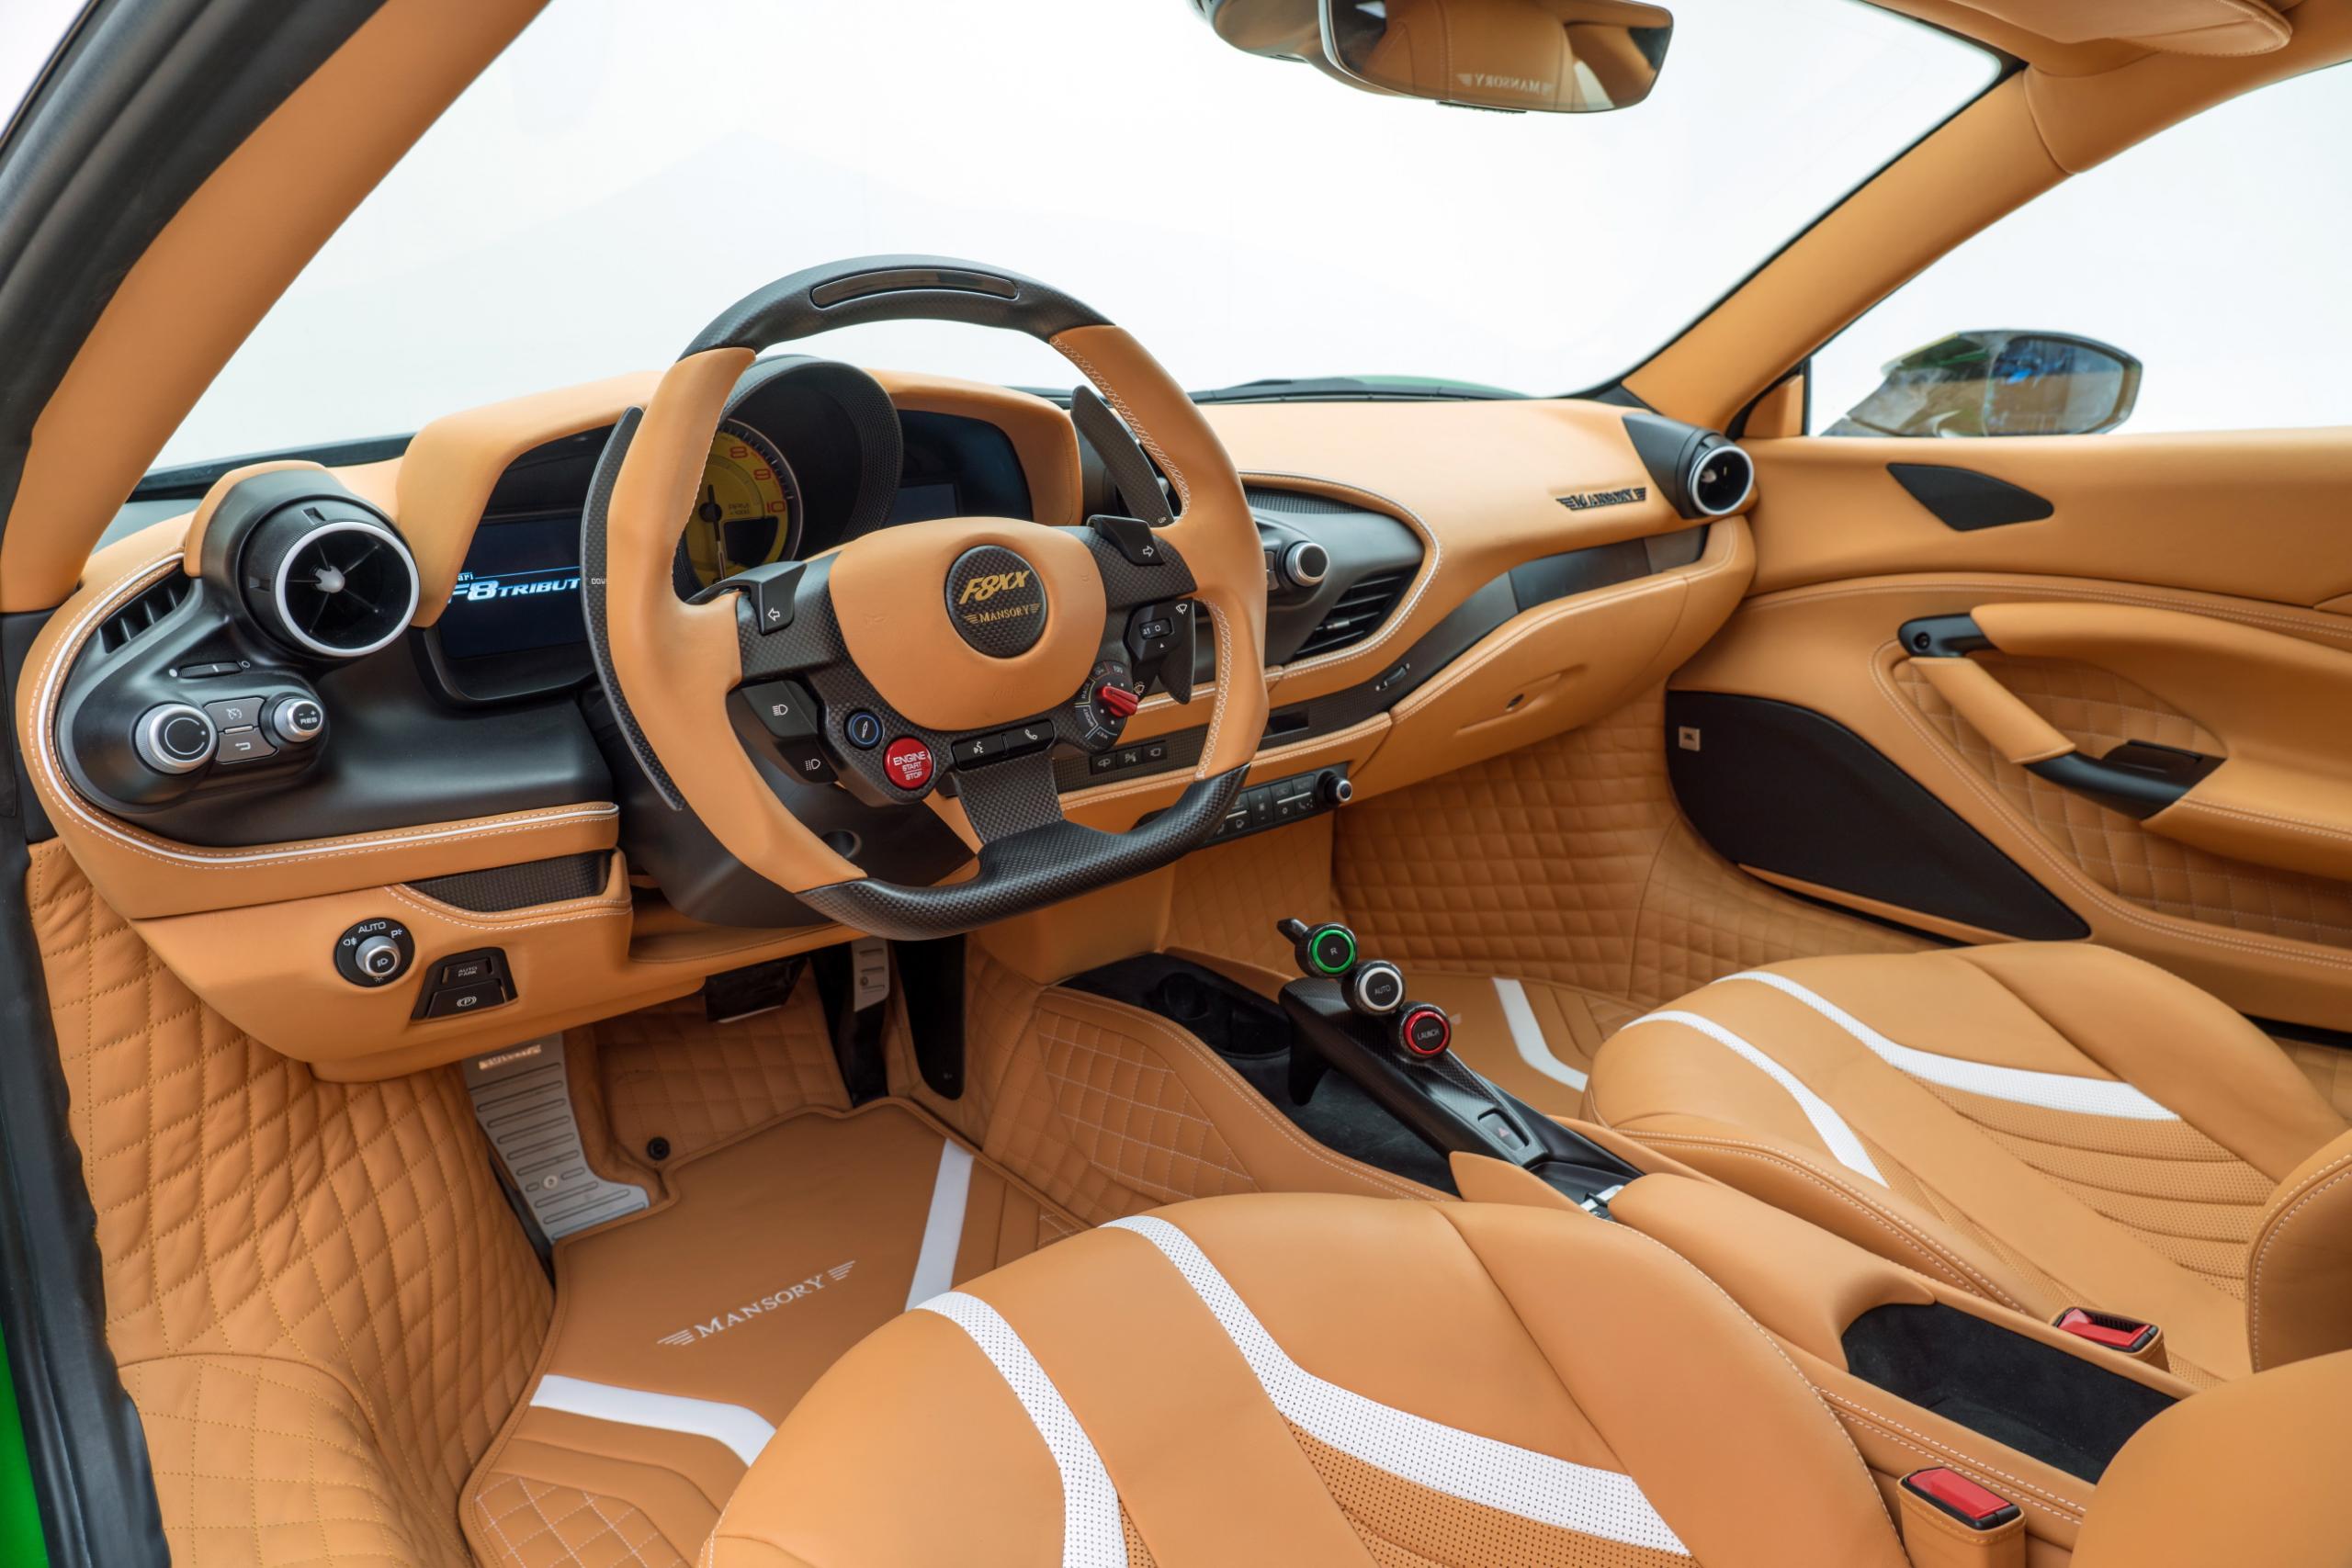 mansory f8xx ferrari f8 body kit carbon fiber steering wheel leather bespoke interior wheel 2020 2021